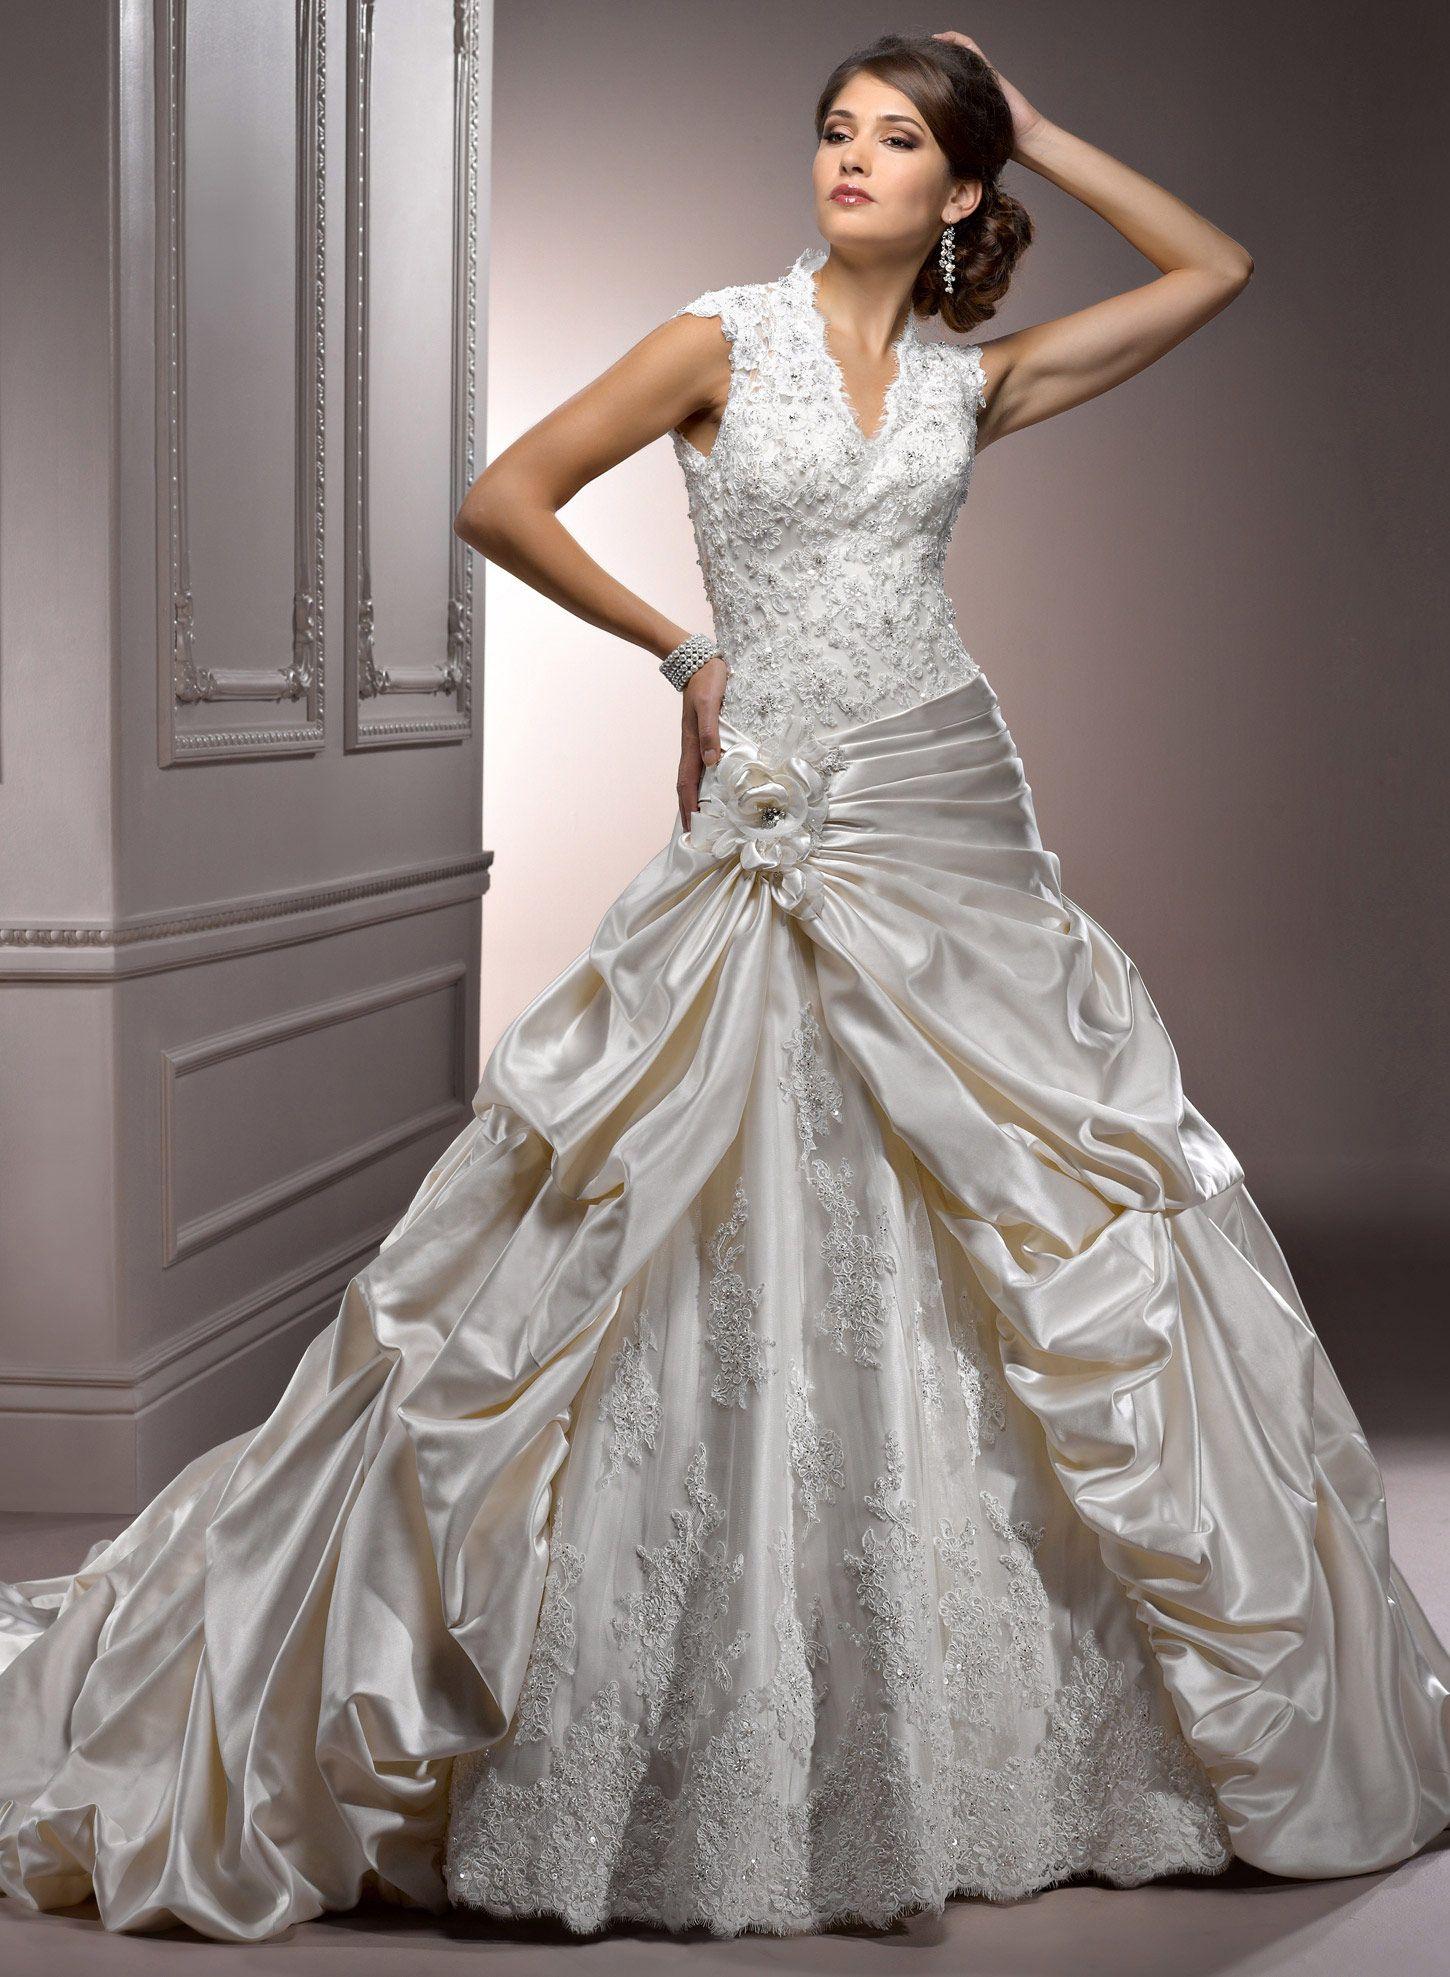 Maggie Sottero Wedding Dresses in 2020 Wedding dress